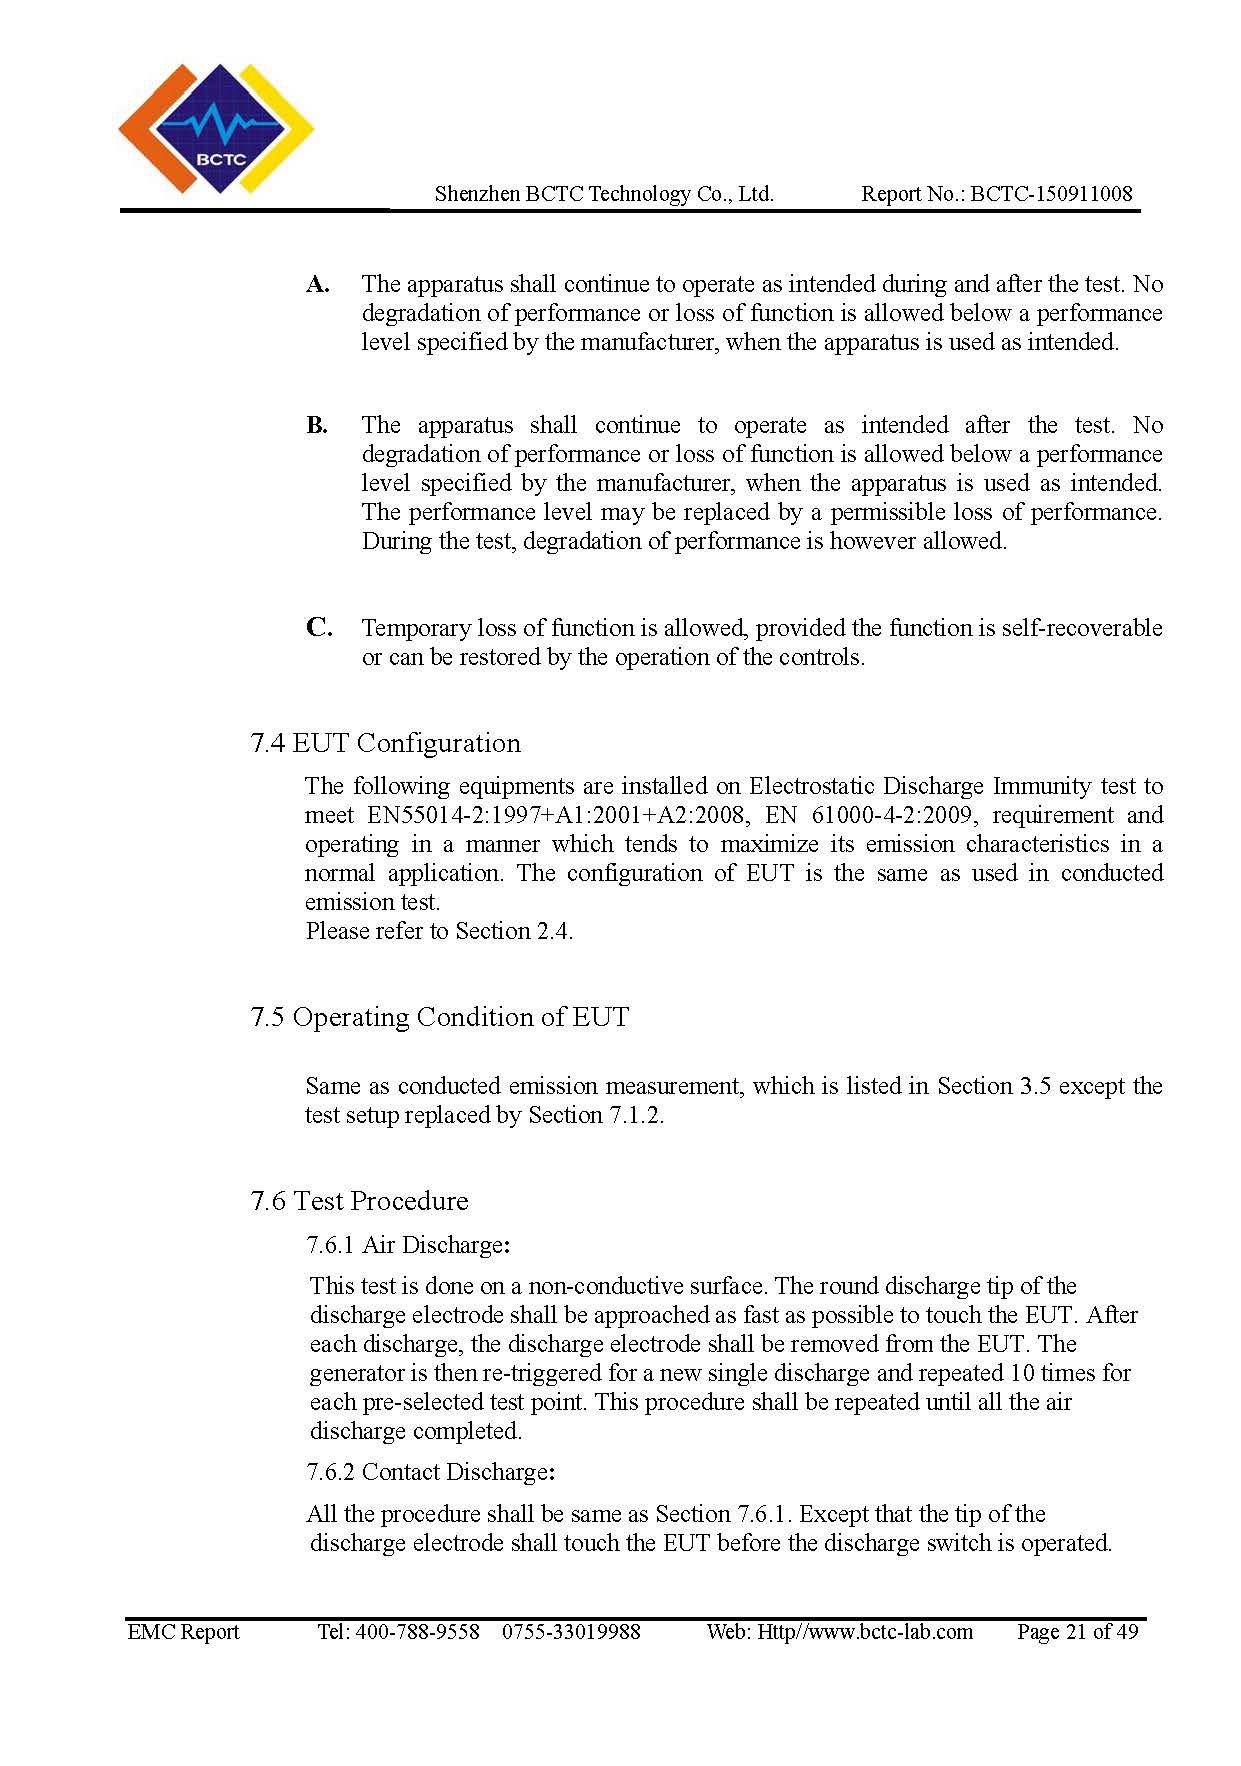 breathe-safe-ce-report-page-21.jpg